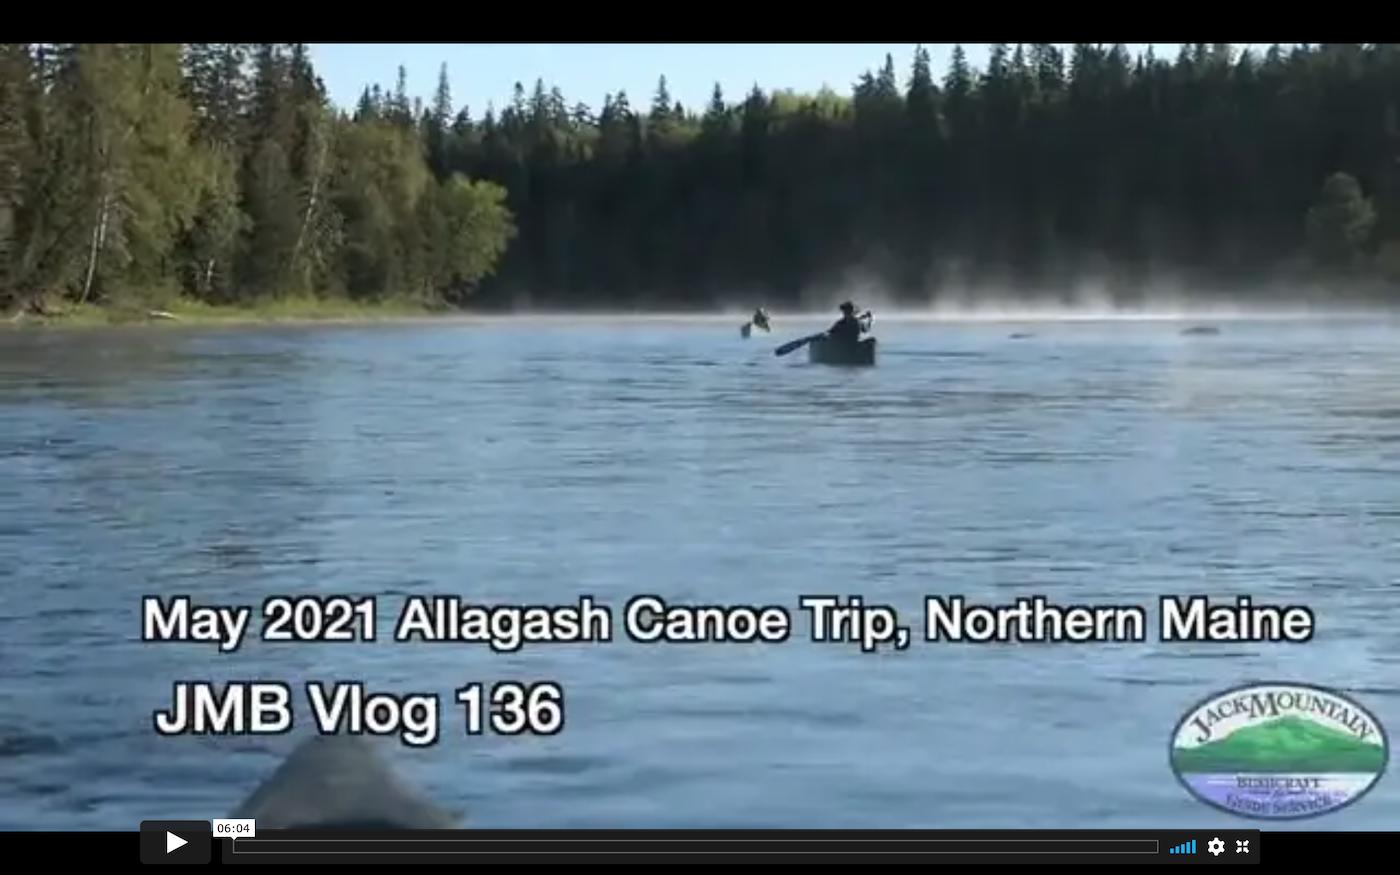 May 2021 Allagash Canoe Trip   JMB Vlog 136